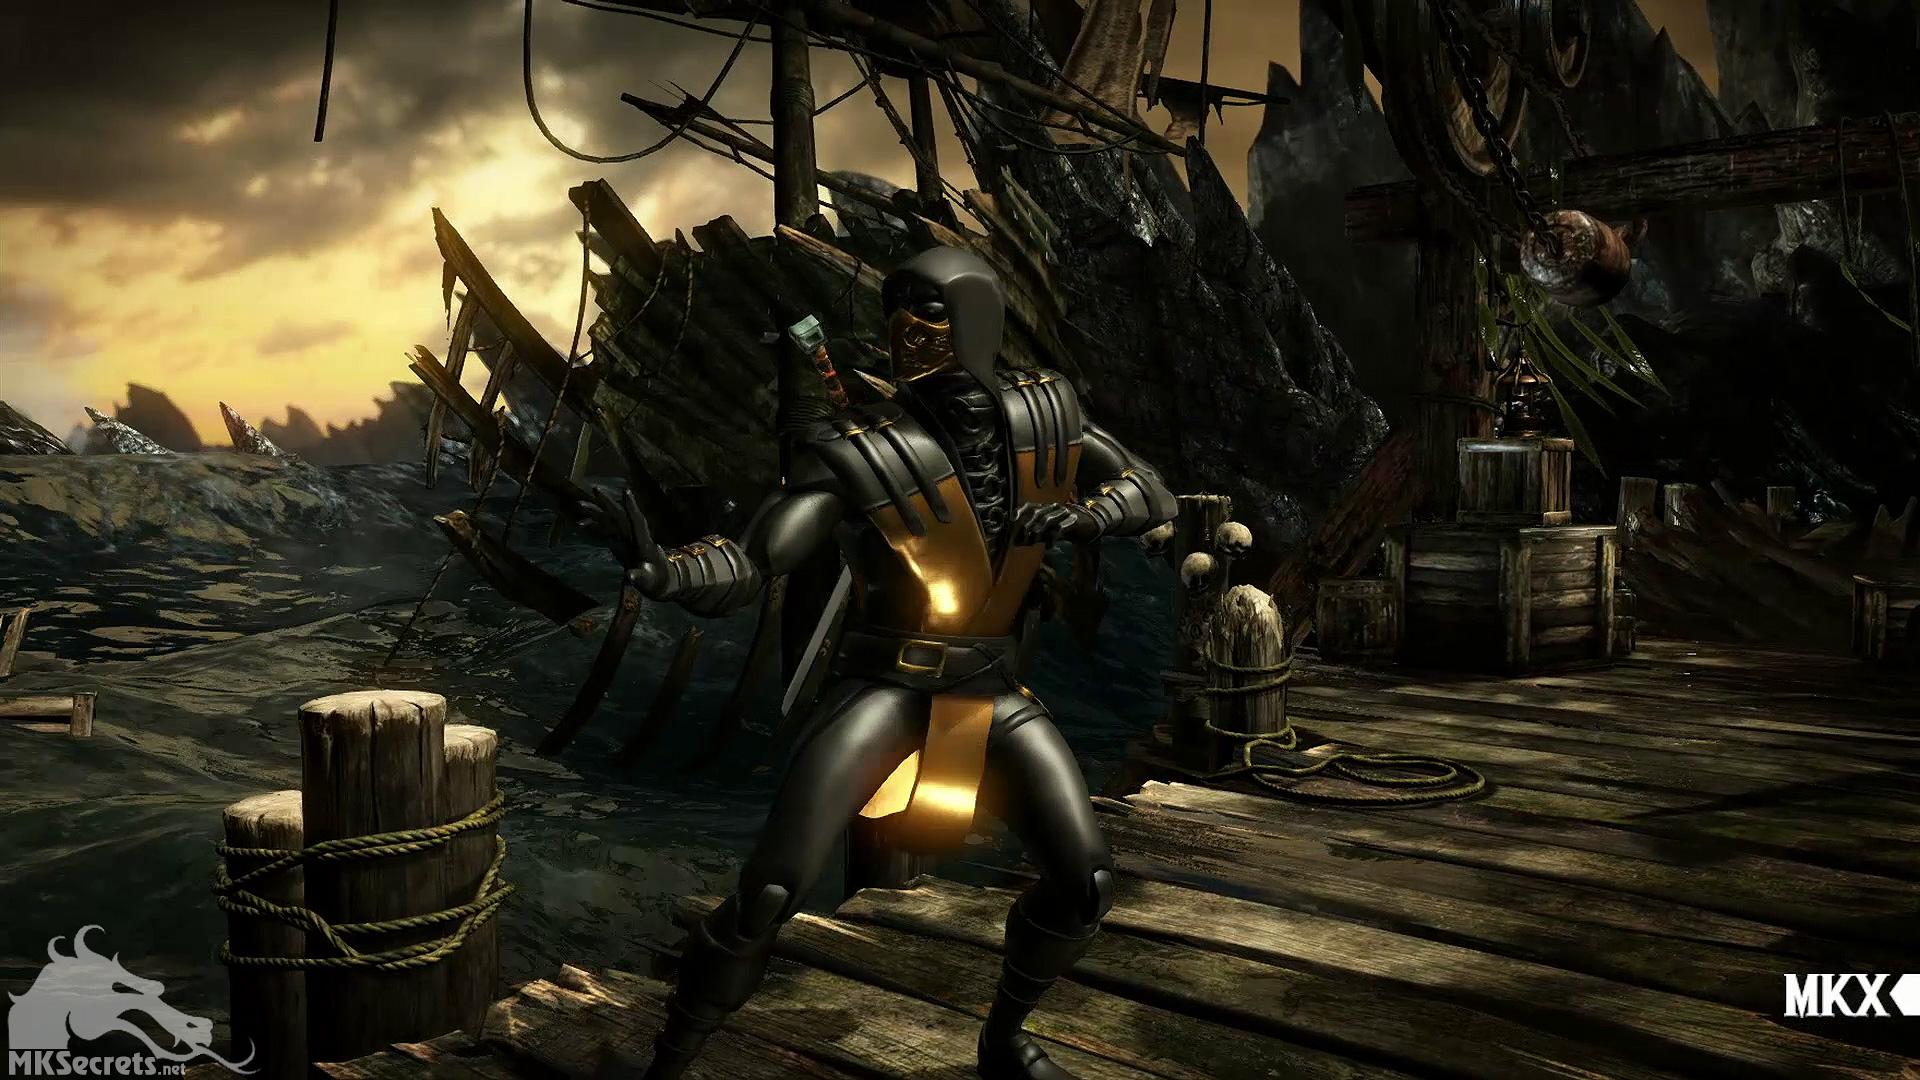 Screenshot - Old Movie MKX (Mortal Kombat X)